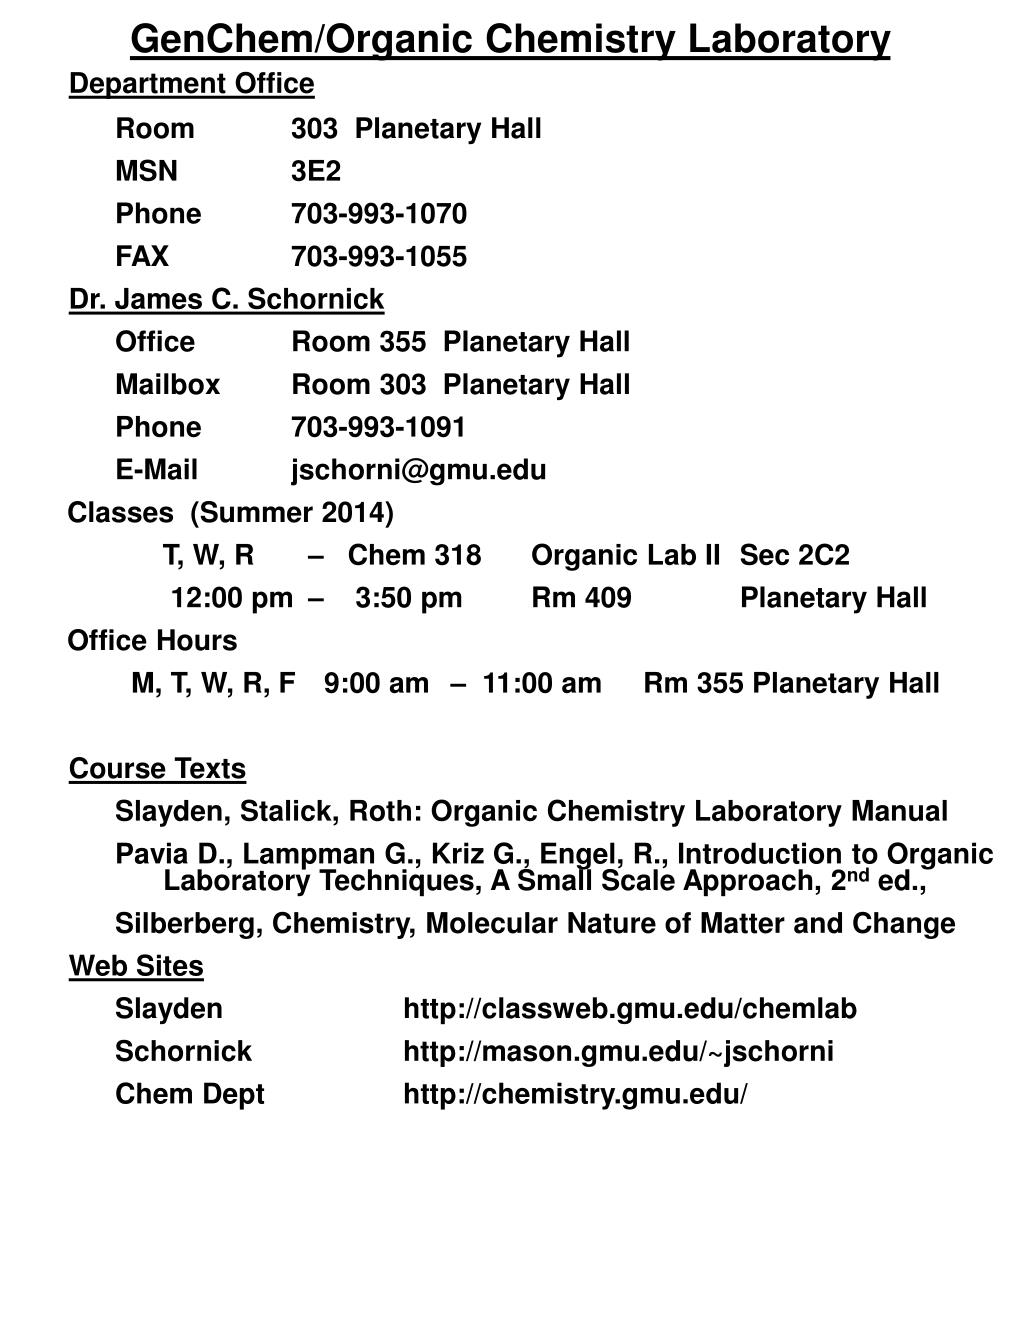 PPT - GenChem /Organic Chemistry Laboratory Department Office Room 303  Planetary Hall MSN 3E2 PowerPoint Presentation - ID:1907545